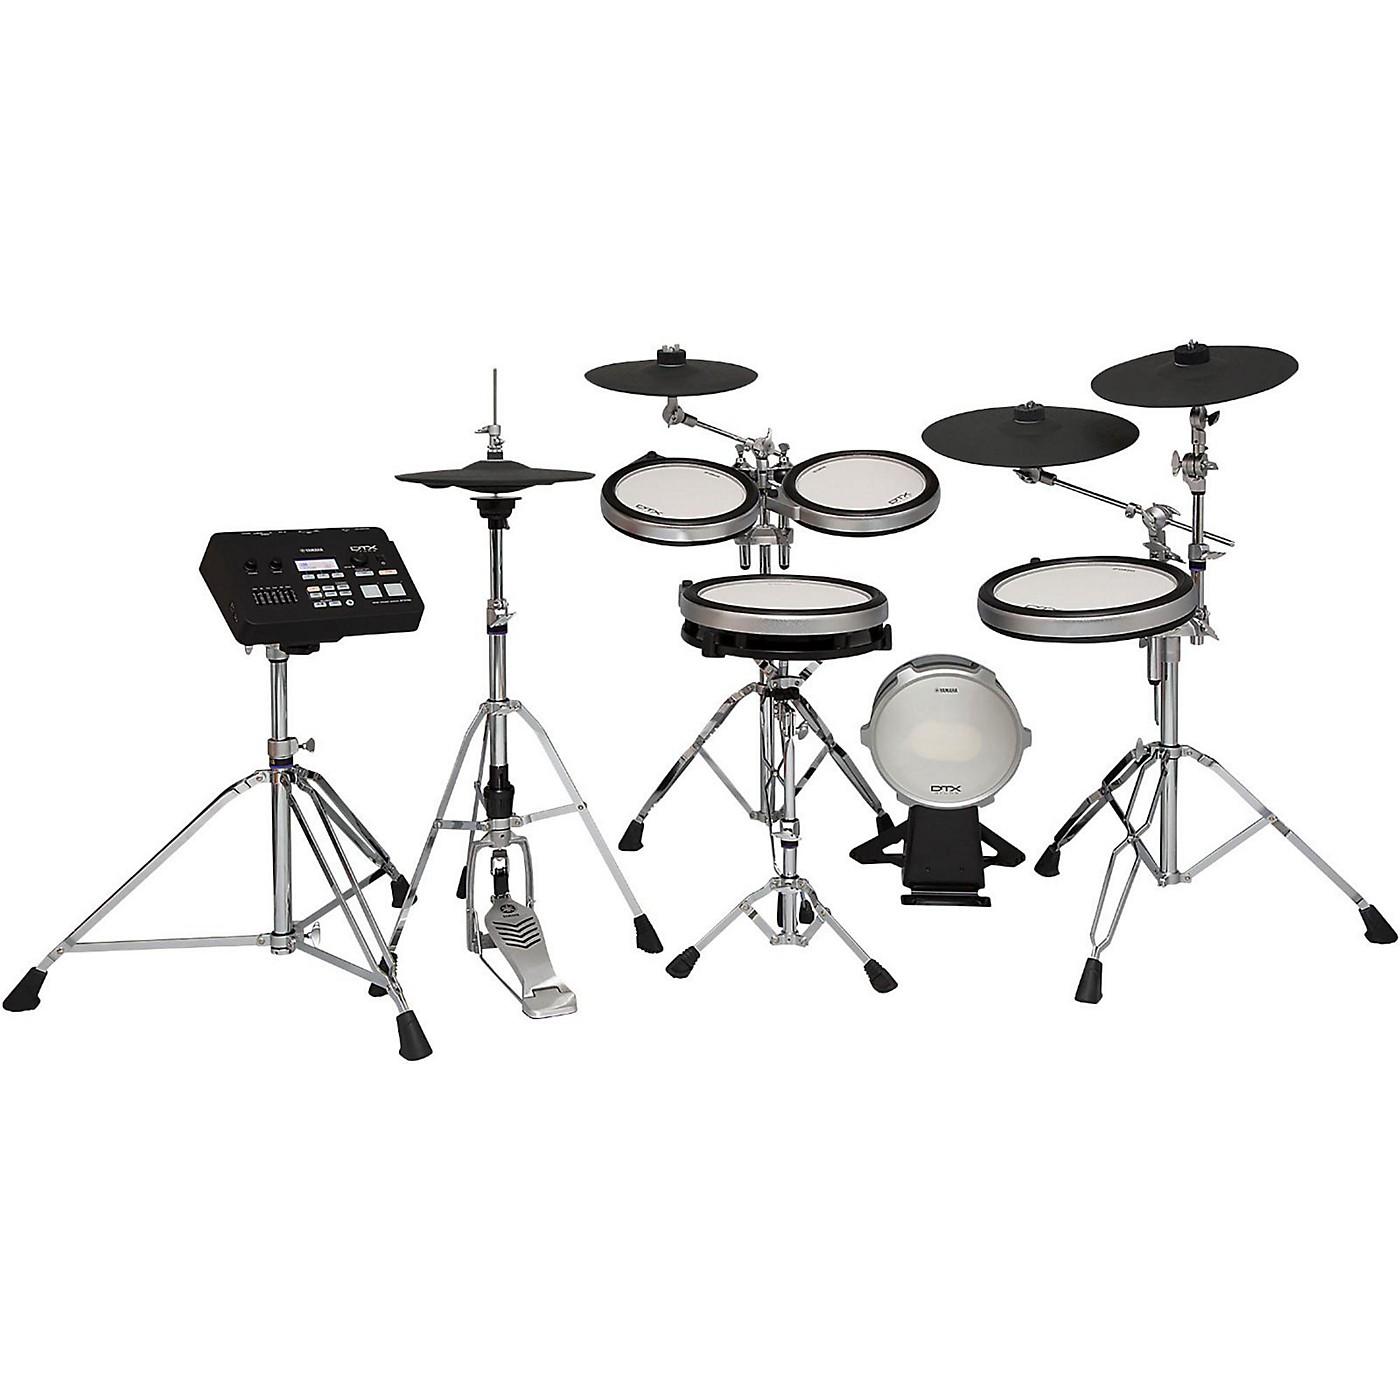 Yamaha DTX 760K Electronic Drum Set with Hardware Pack thumbnail